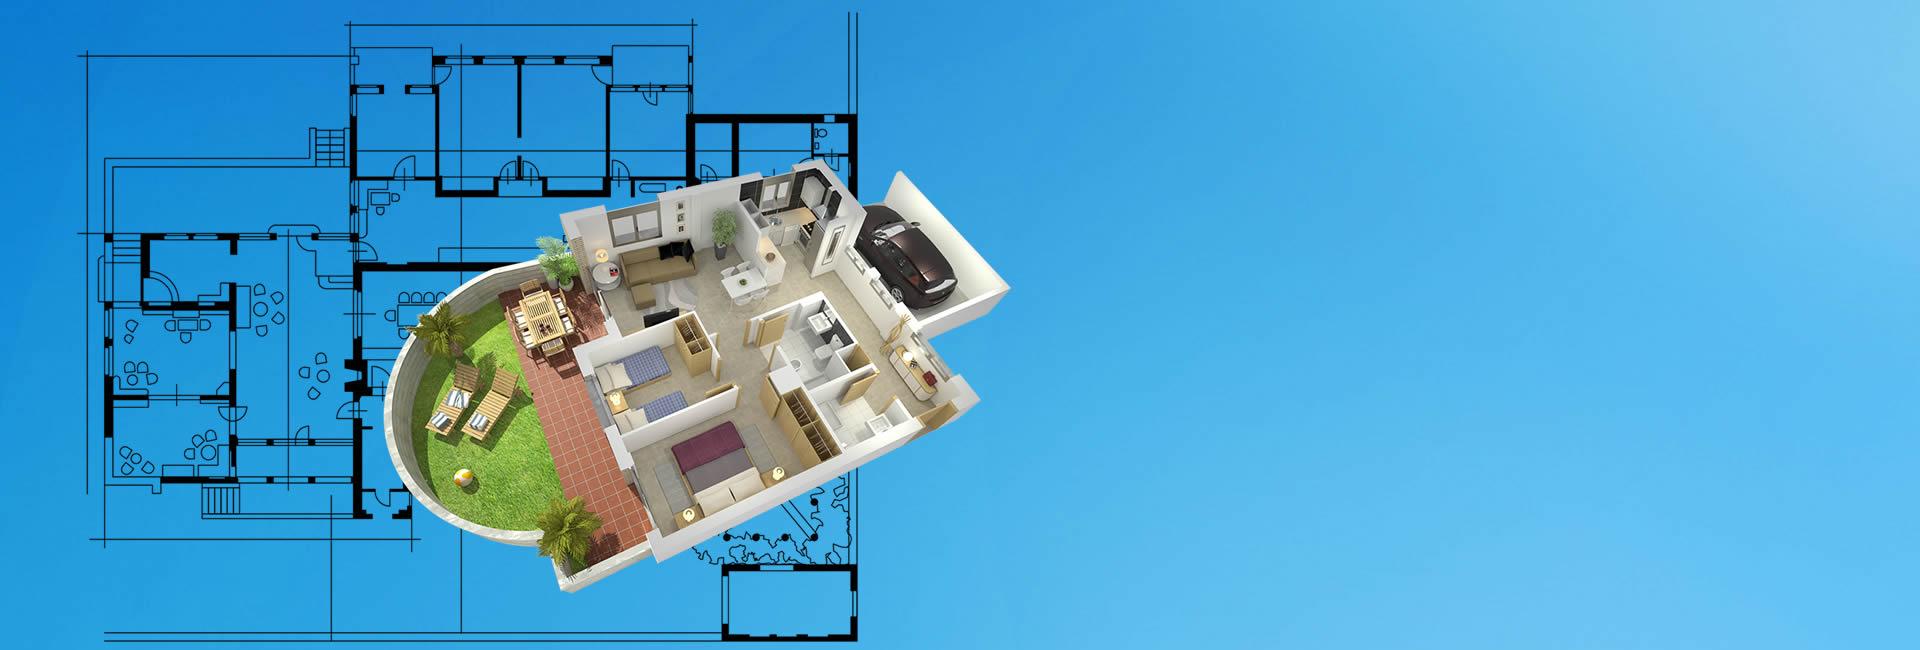 Materiales plutarco casa de materiales para construcci n - Casa de materiales de construccion ...